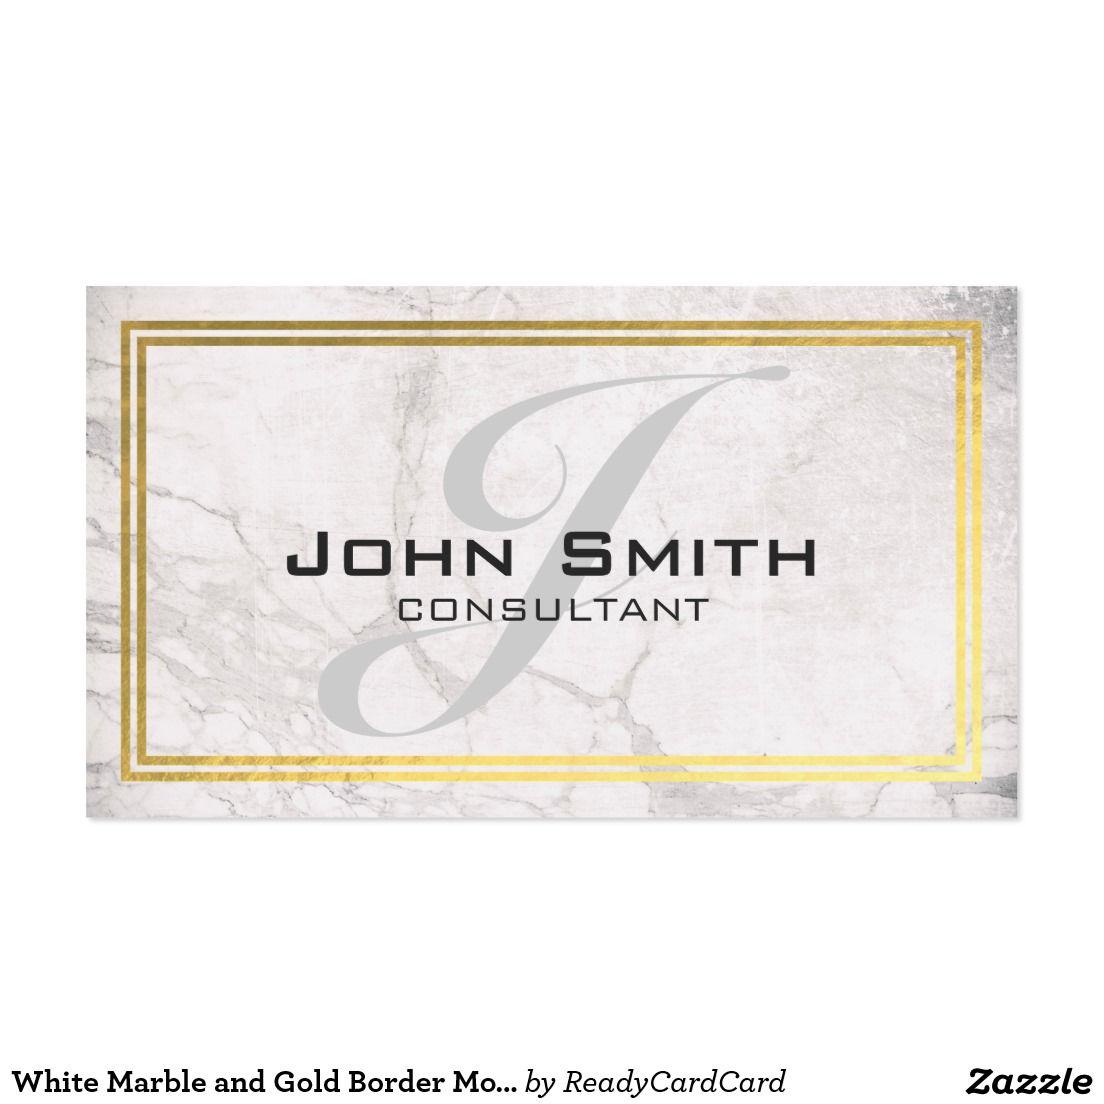 White marble and gold border monogram consultant business card white marble and gold border monogram consultant business card magicingreecefo Images